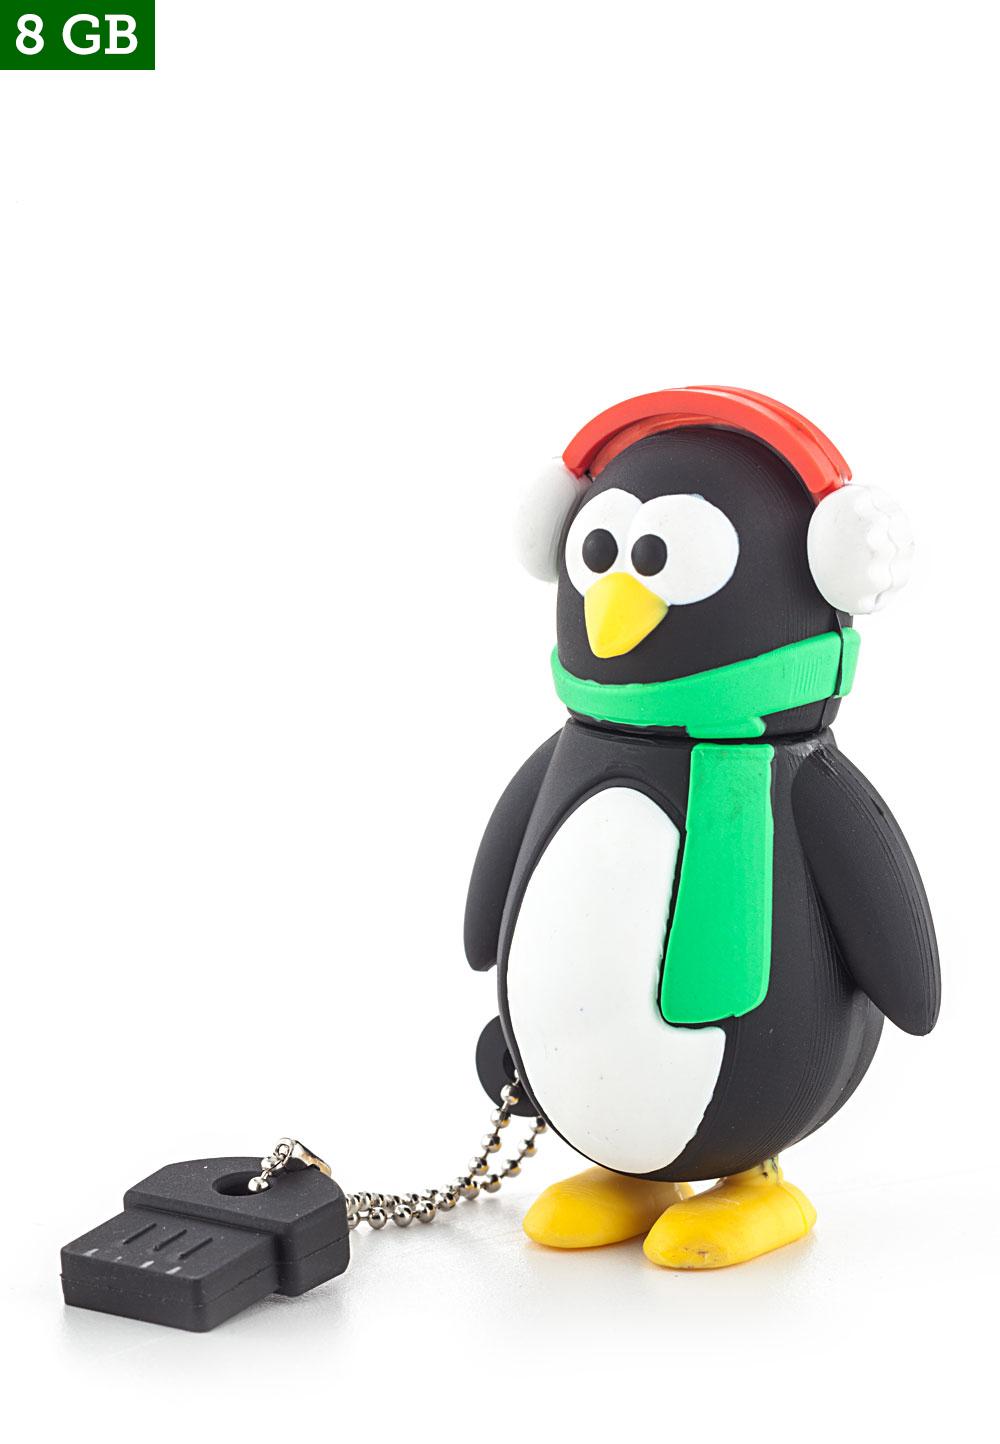 MEM STICK 8 GB - PINGUIN